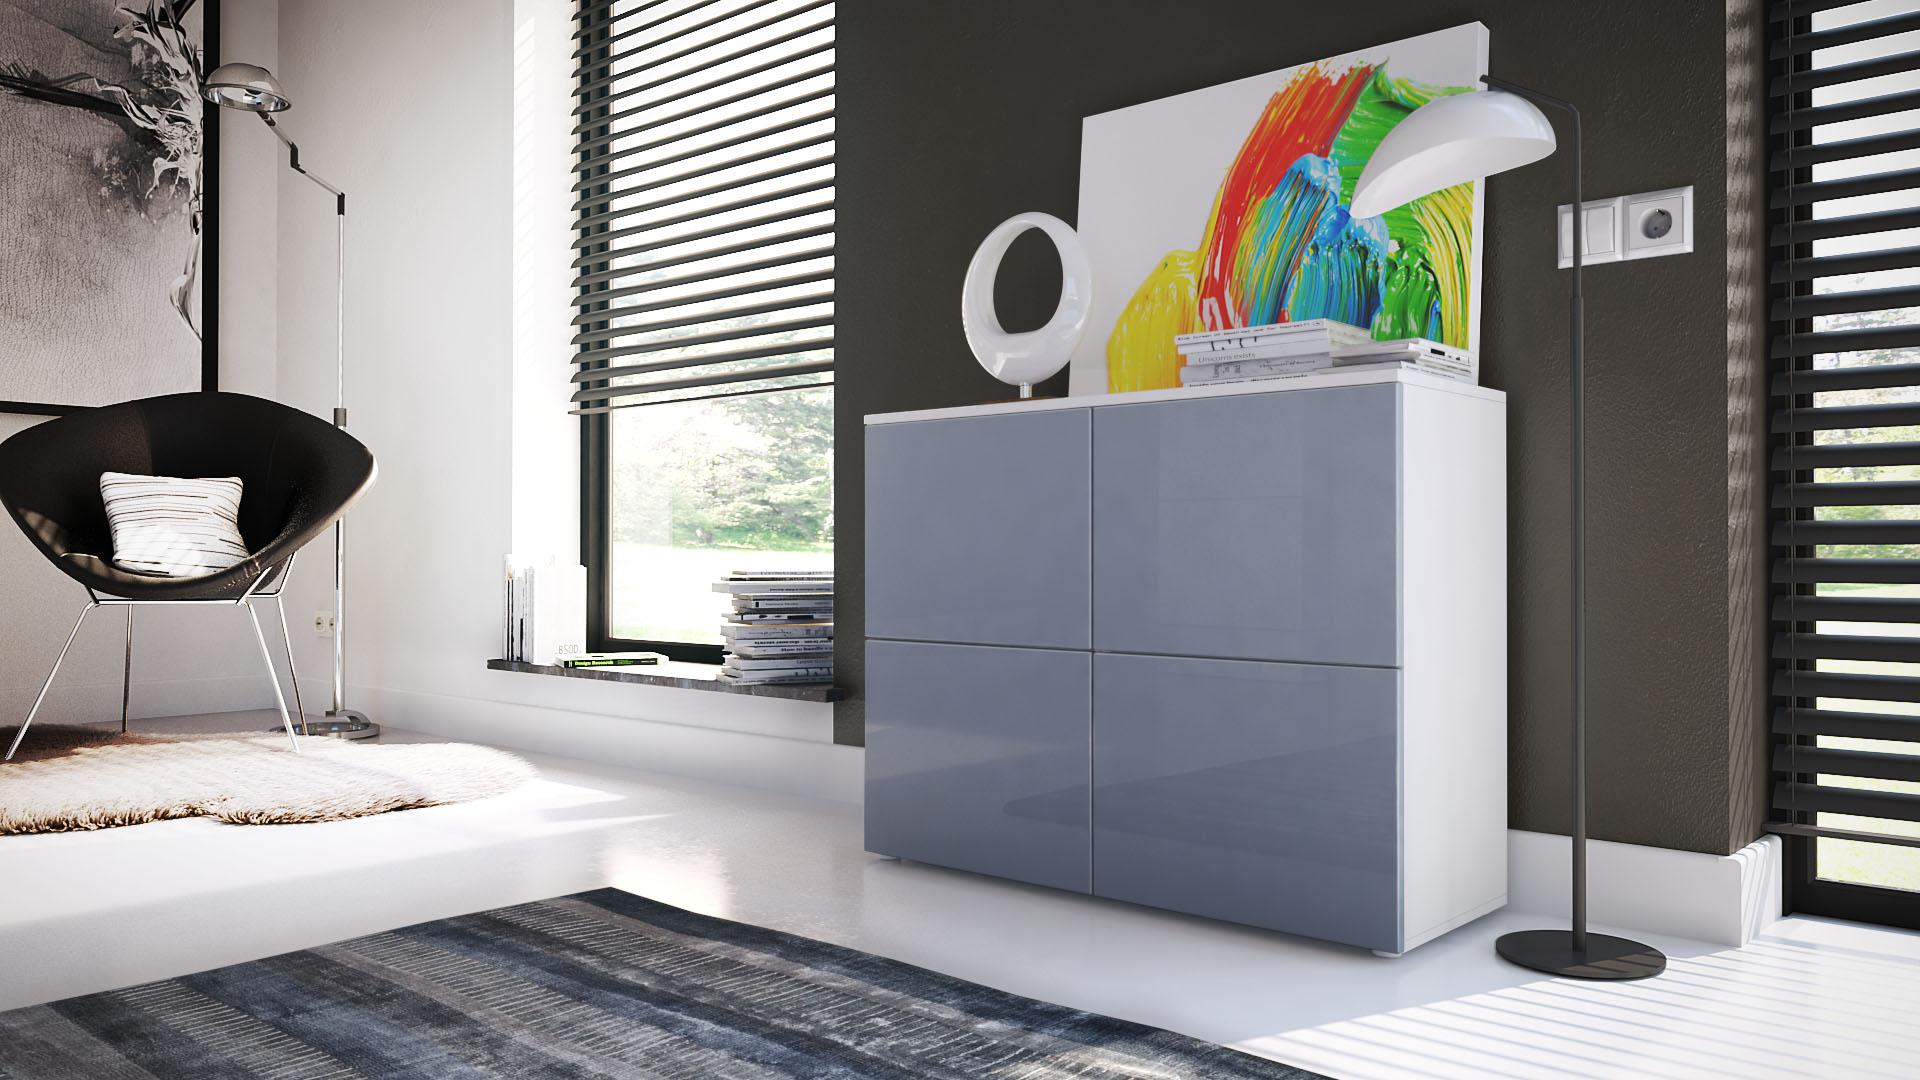 kommode schrank anrichte sideboard highboard regal rova wei hochglanz ebay. Black Bedroom Furniture Sets. Home Design Ideas